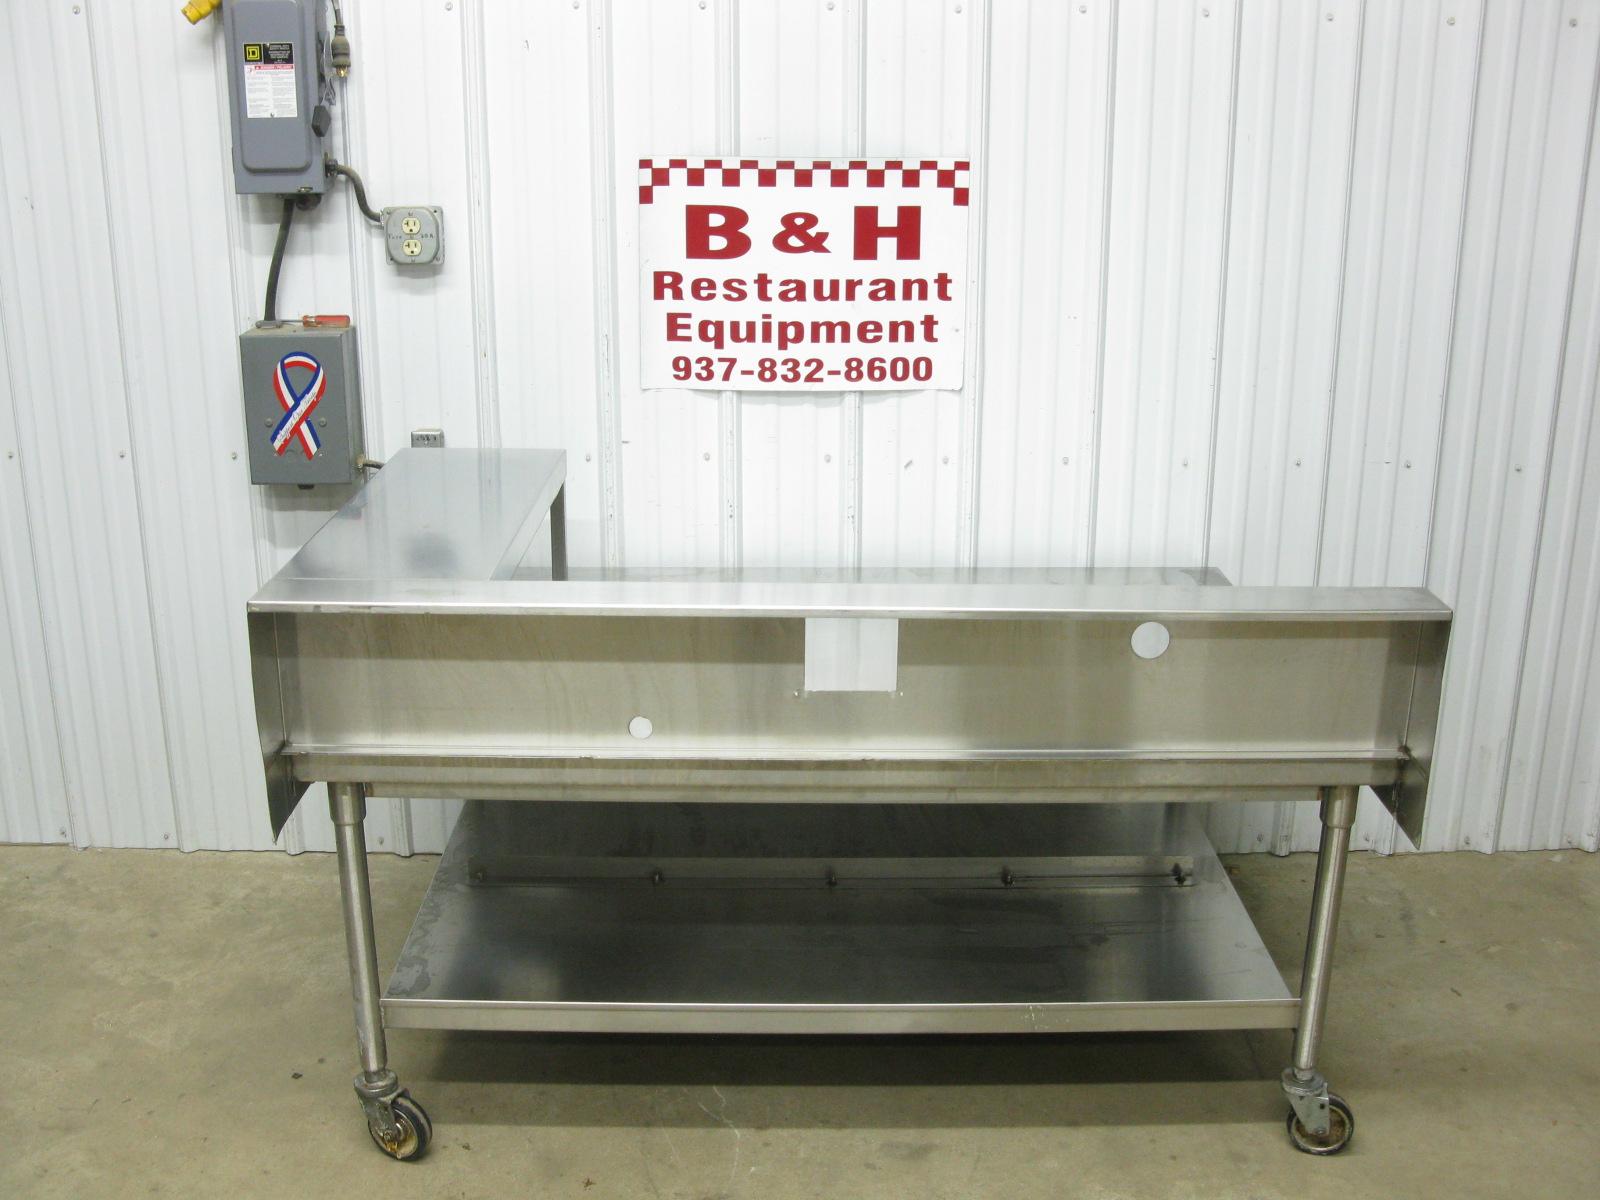 60u2033 x 45u2033 stainless steel griddle grill fryer equipment stand 5u2032 table w shelf